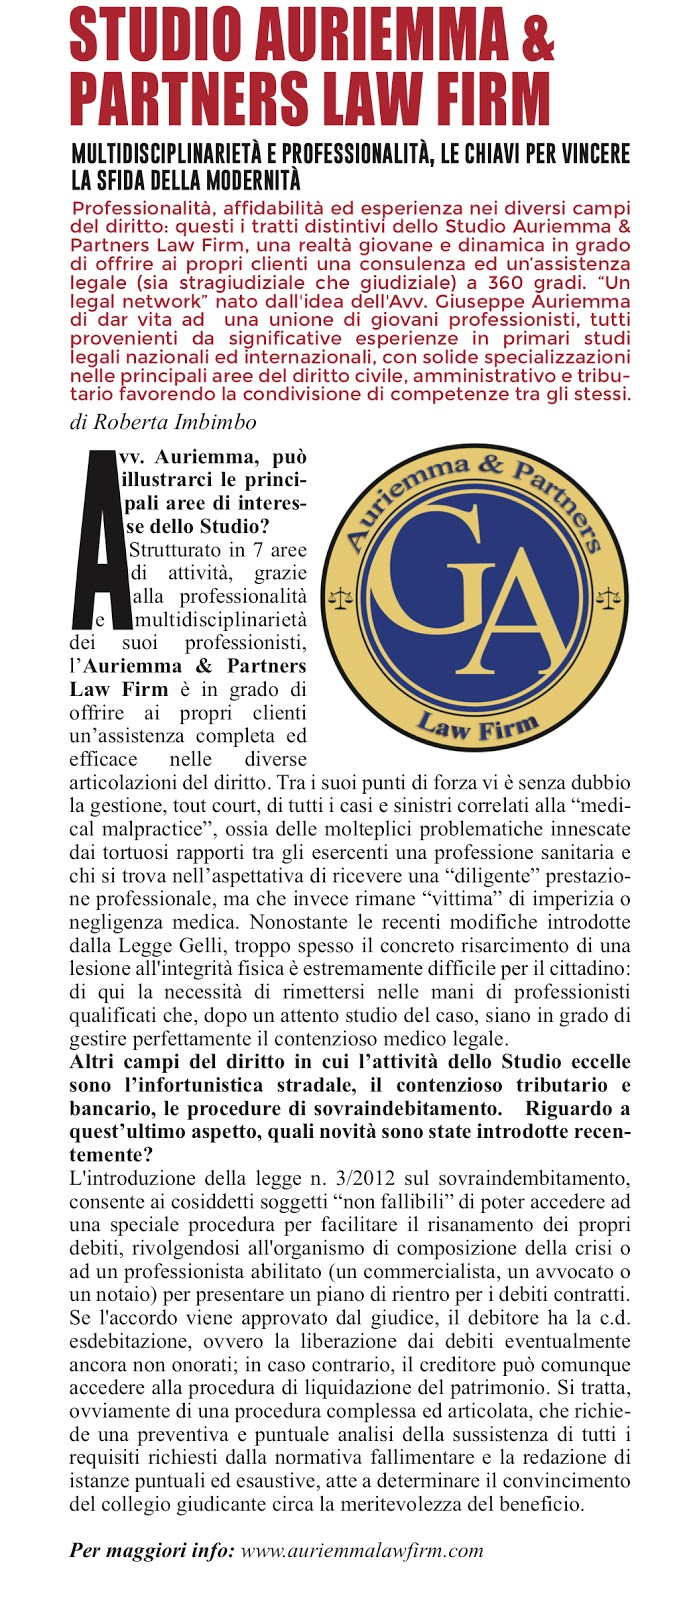 Auriemma Law Firm su Panorama n.51